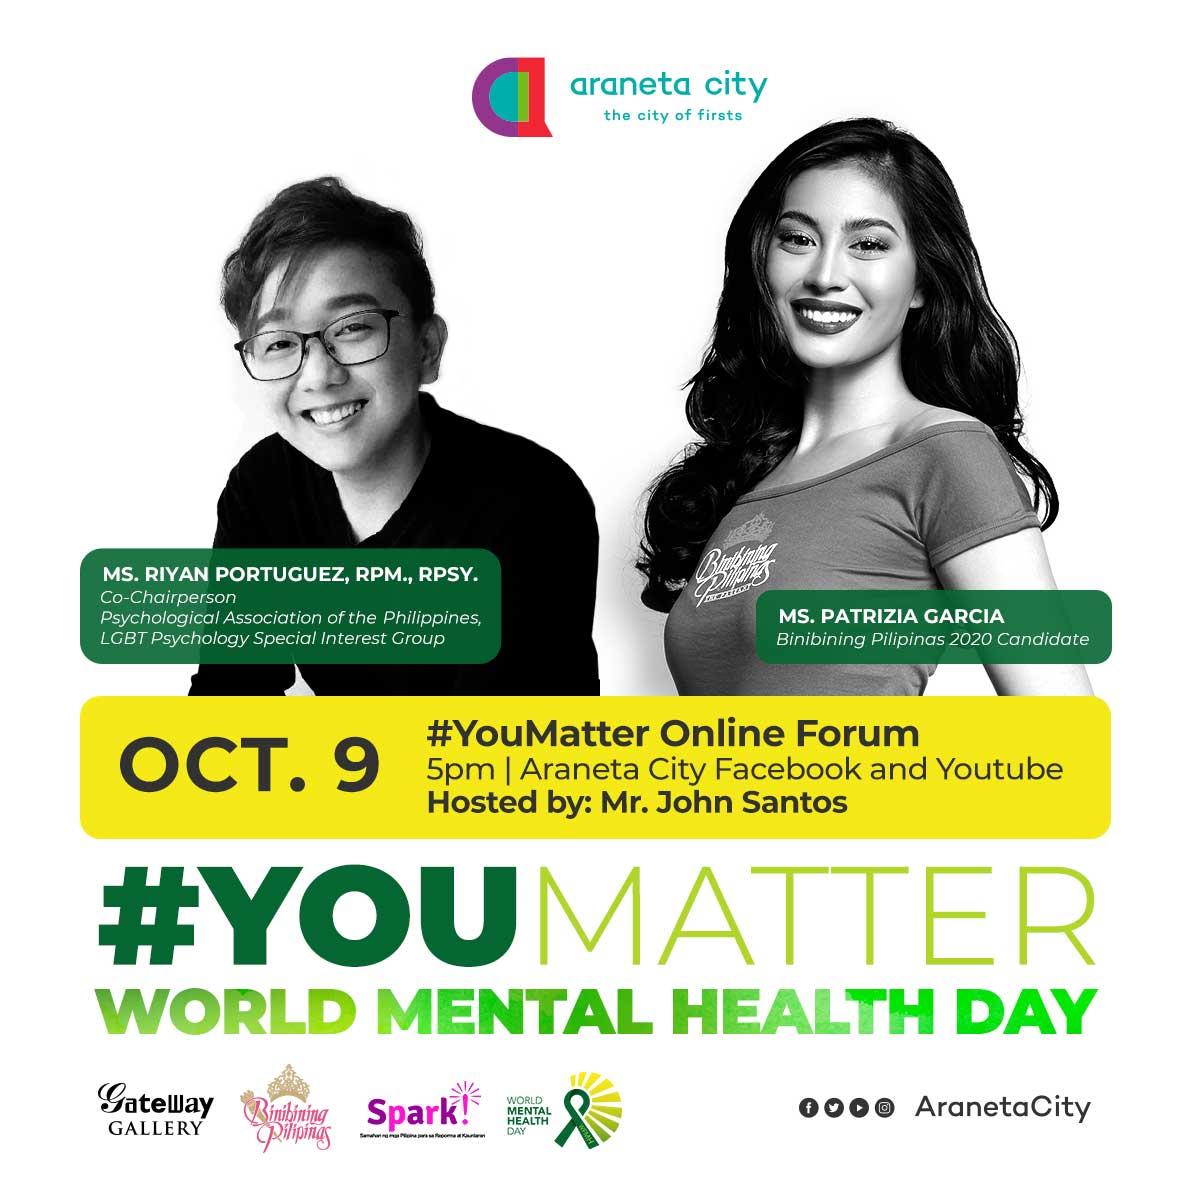 Araneta City celebrates #YouMatter on World Mental Health Day